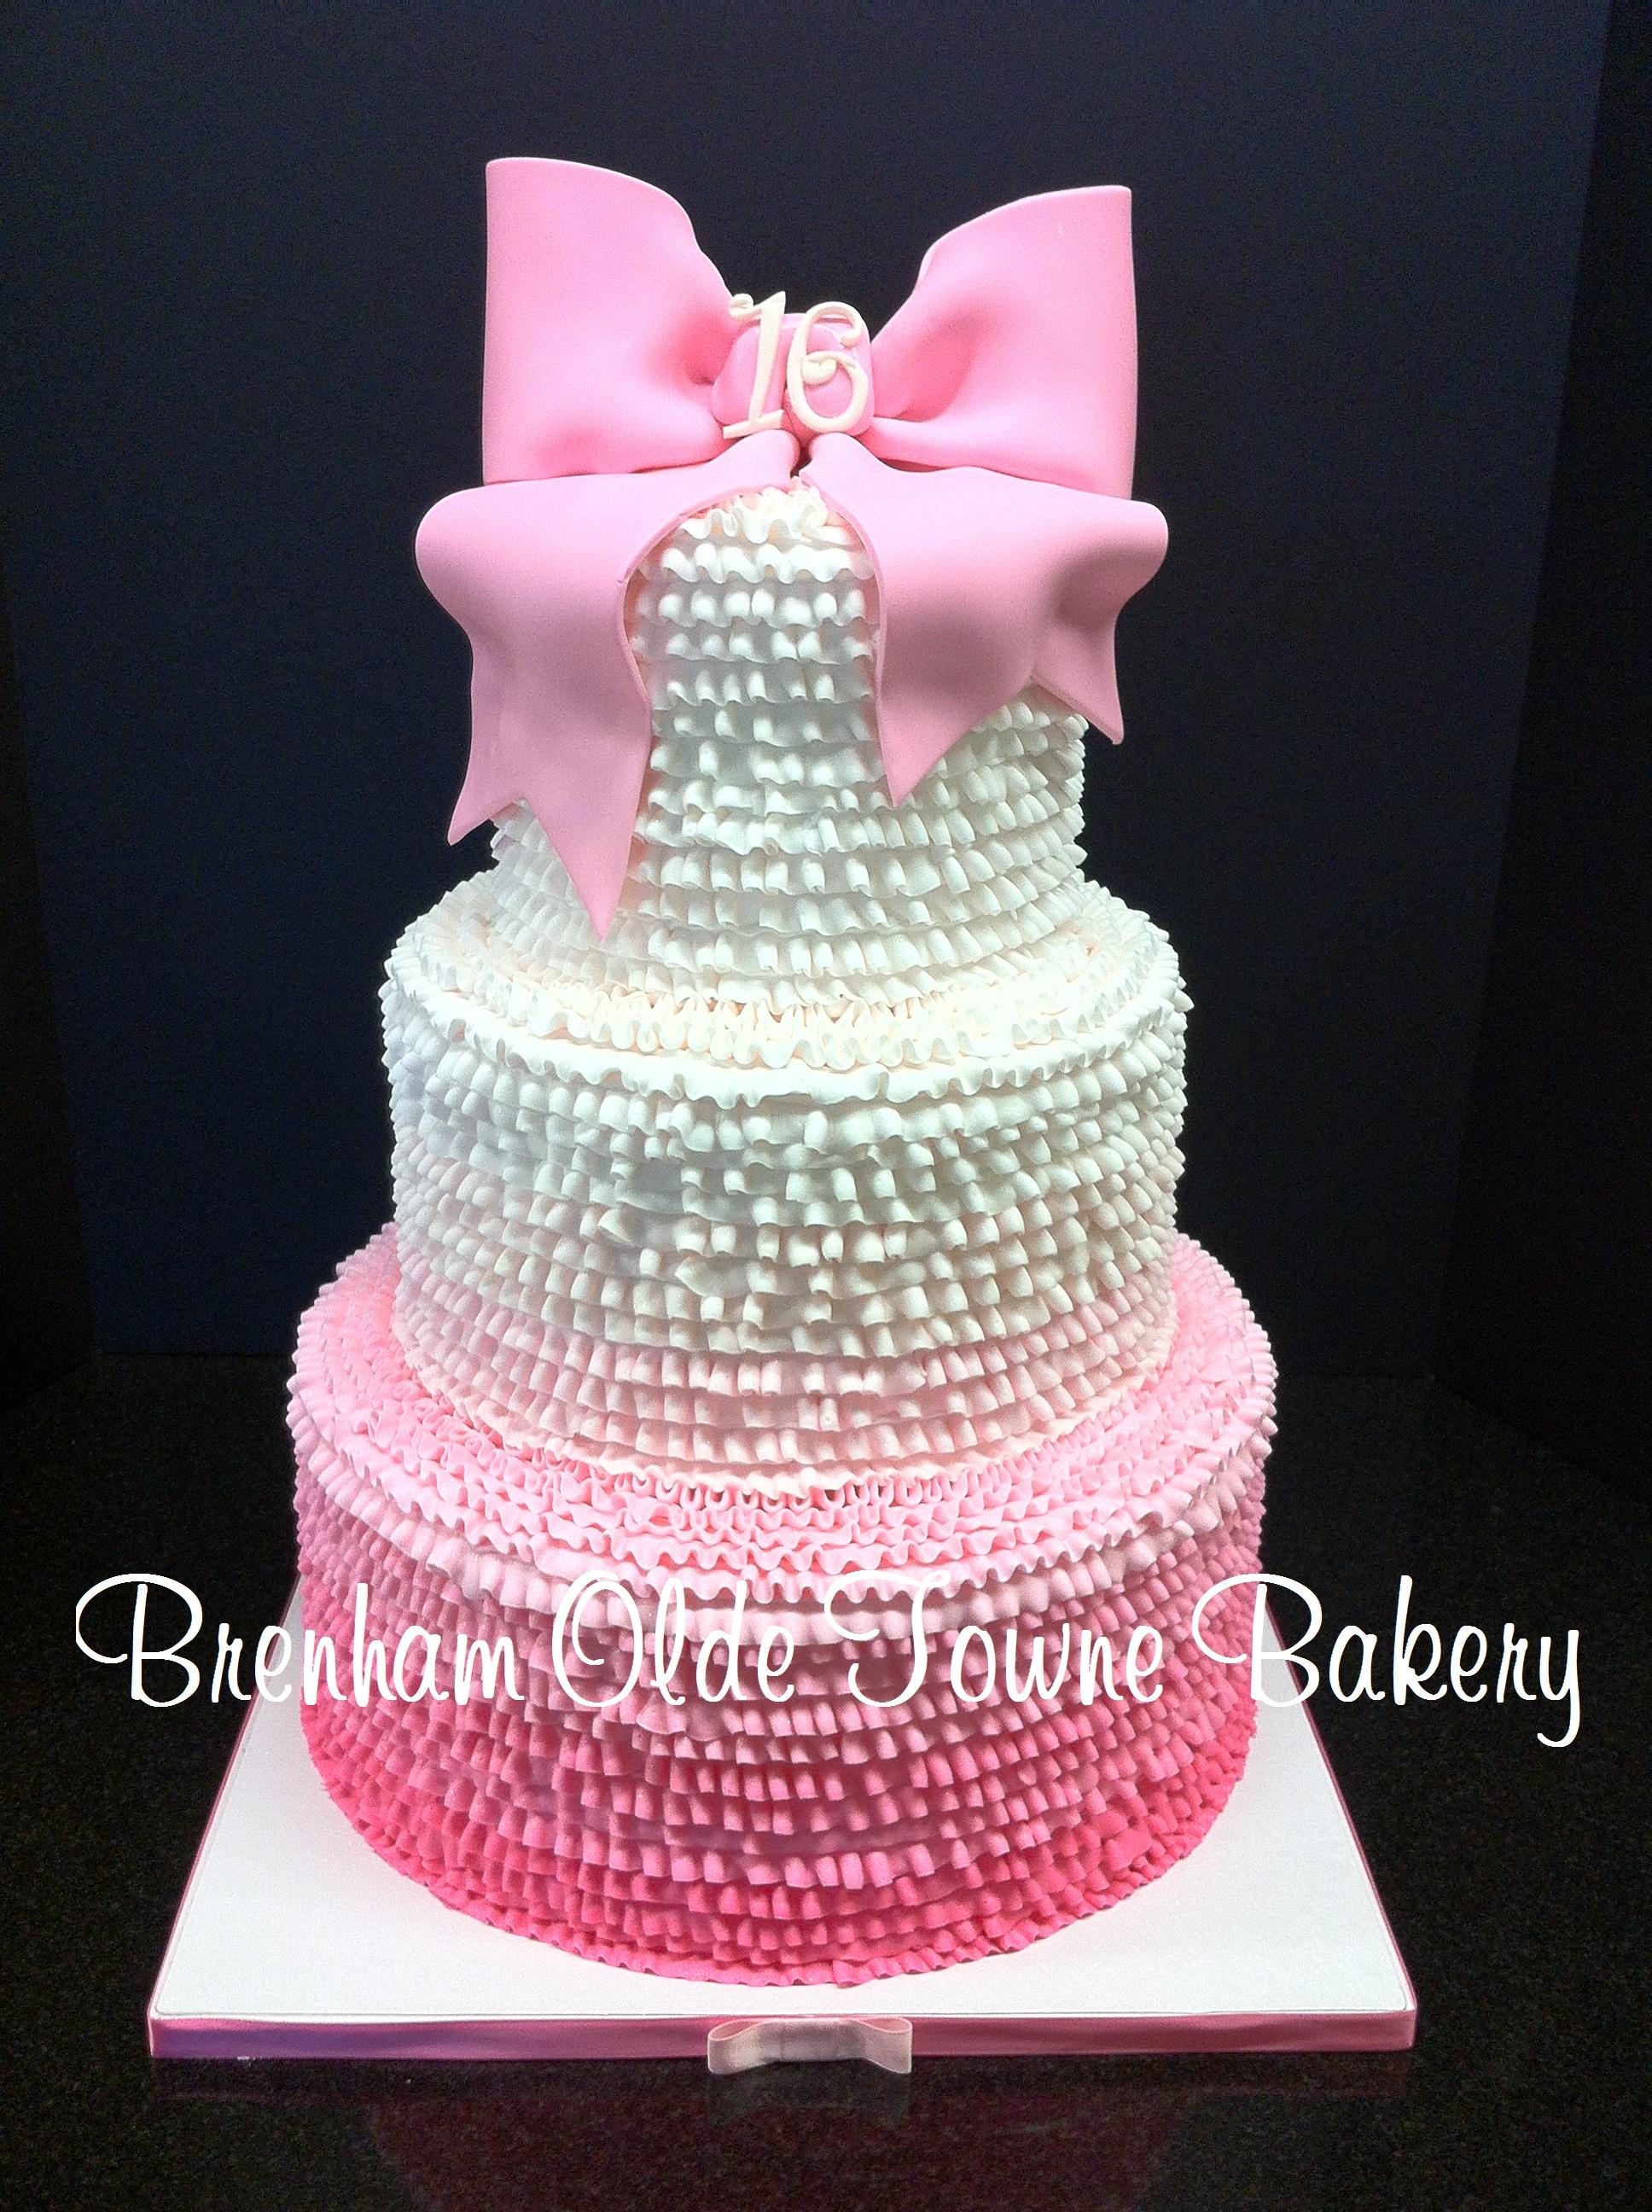 Pc Wire Sleeving Lbs Mahaweli Reach Cakes Bakery Brooklyn Cake